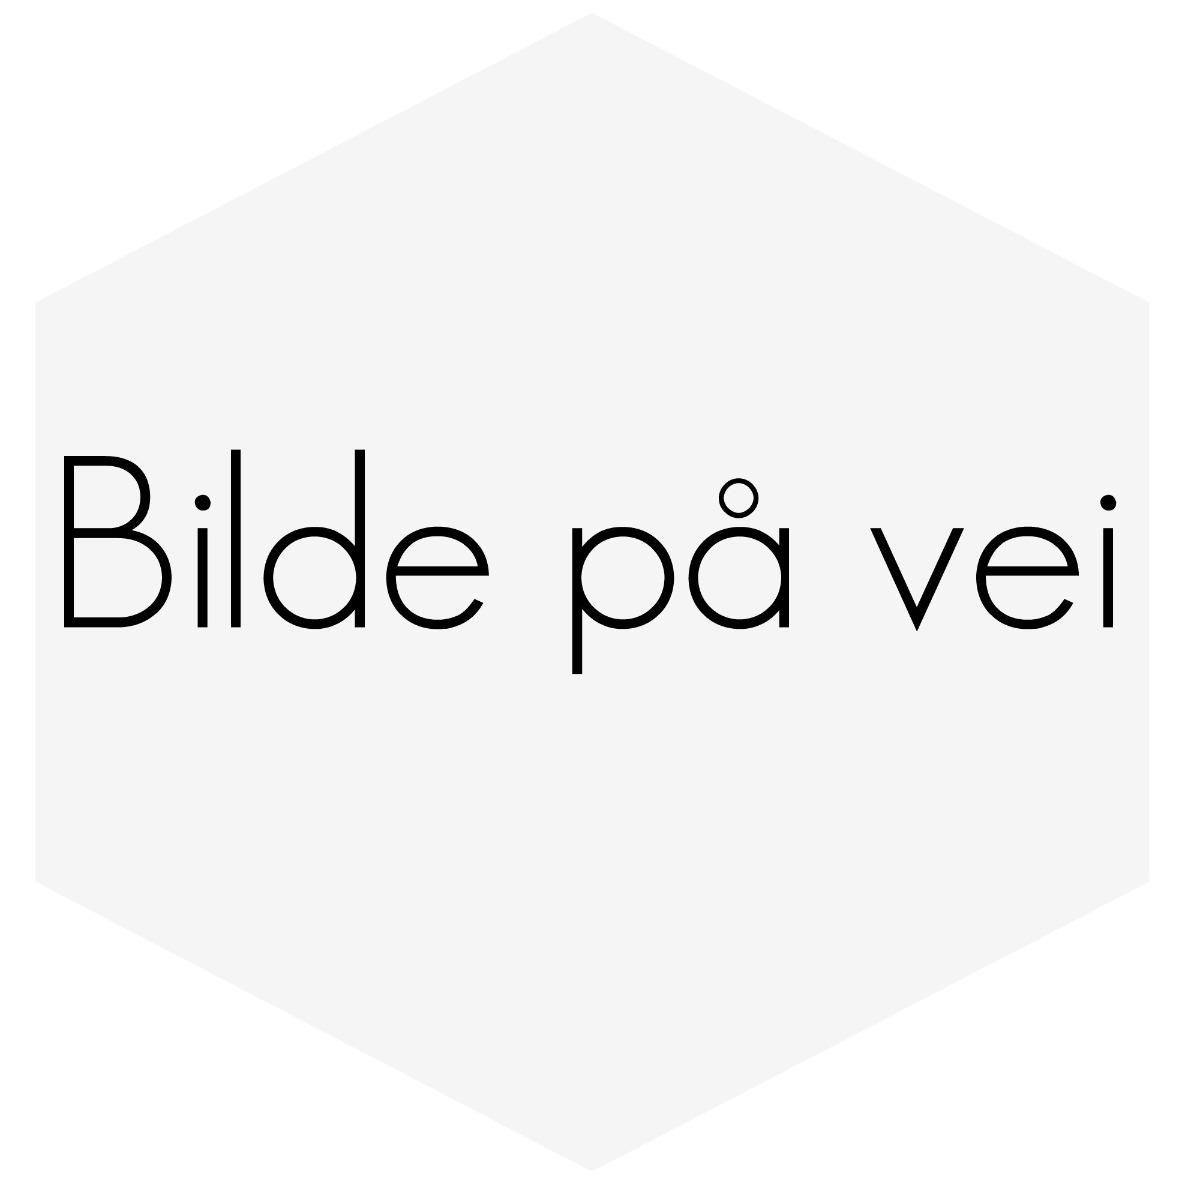 "SILIKONSLANGE RØD REDUSERING 1,25-1,5"" (32-38MM)"